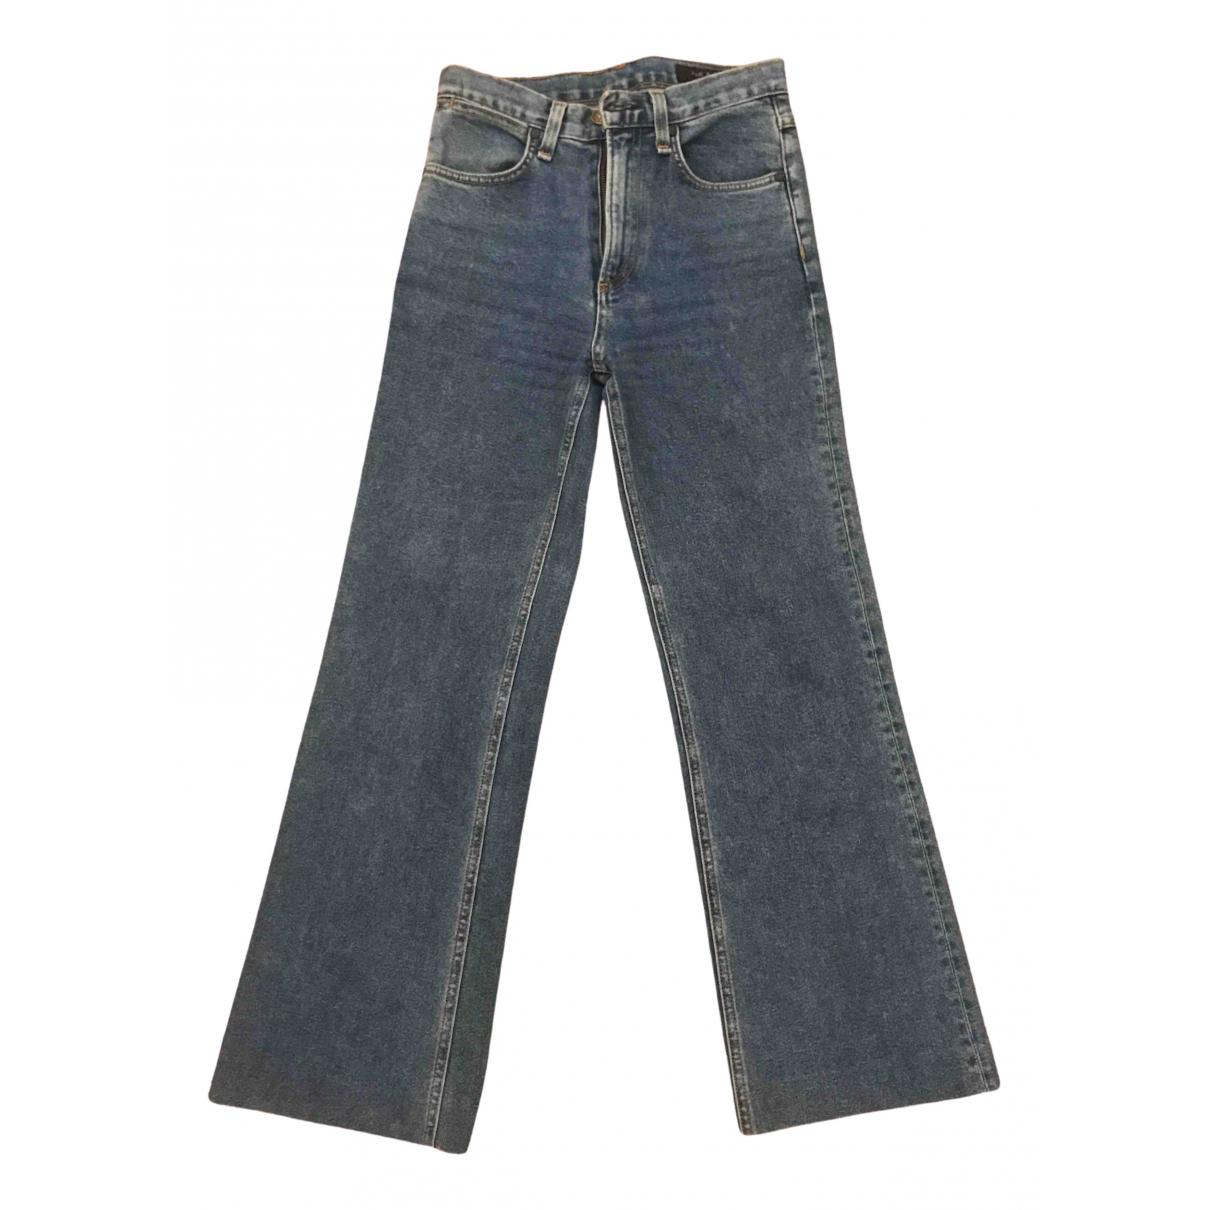 Rag & Bone N Blue Denim - Jeans Jeans for Women 24 US